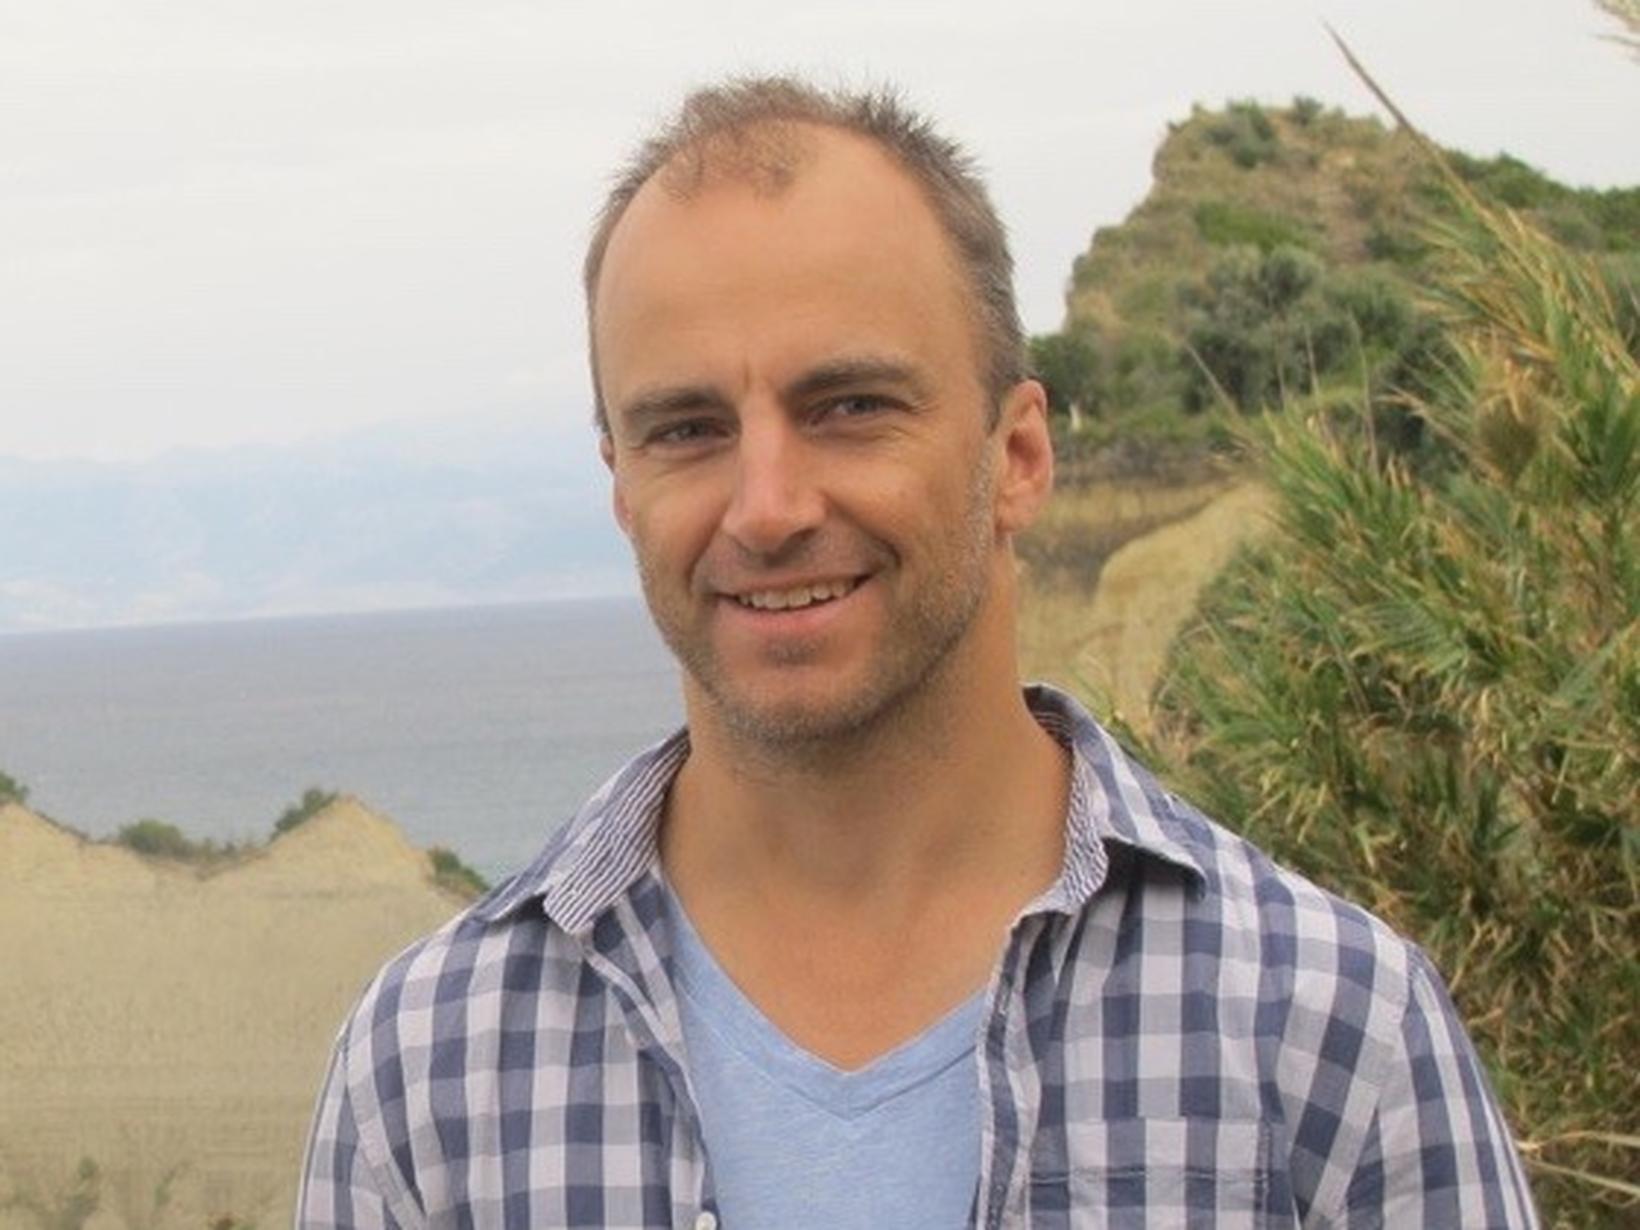 Brett from Sydney, New South Wales, Australia